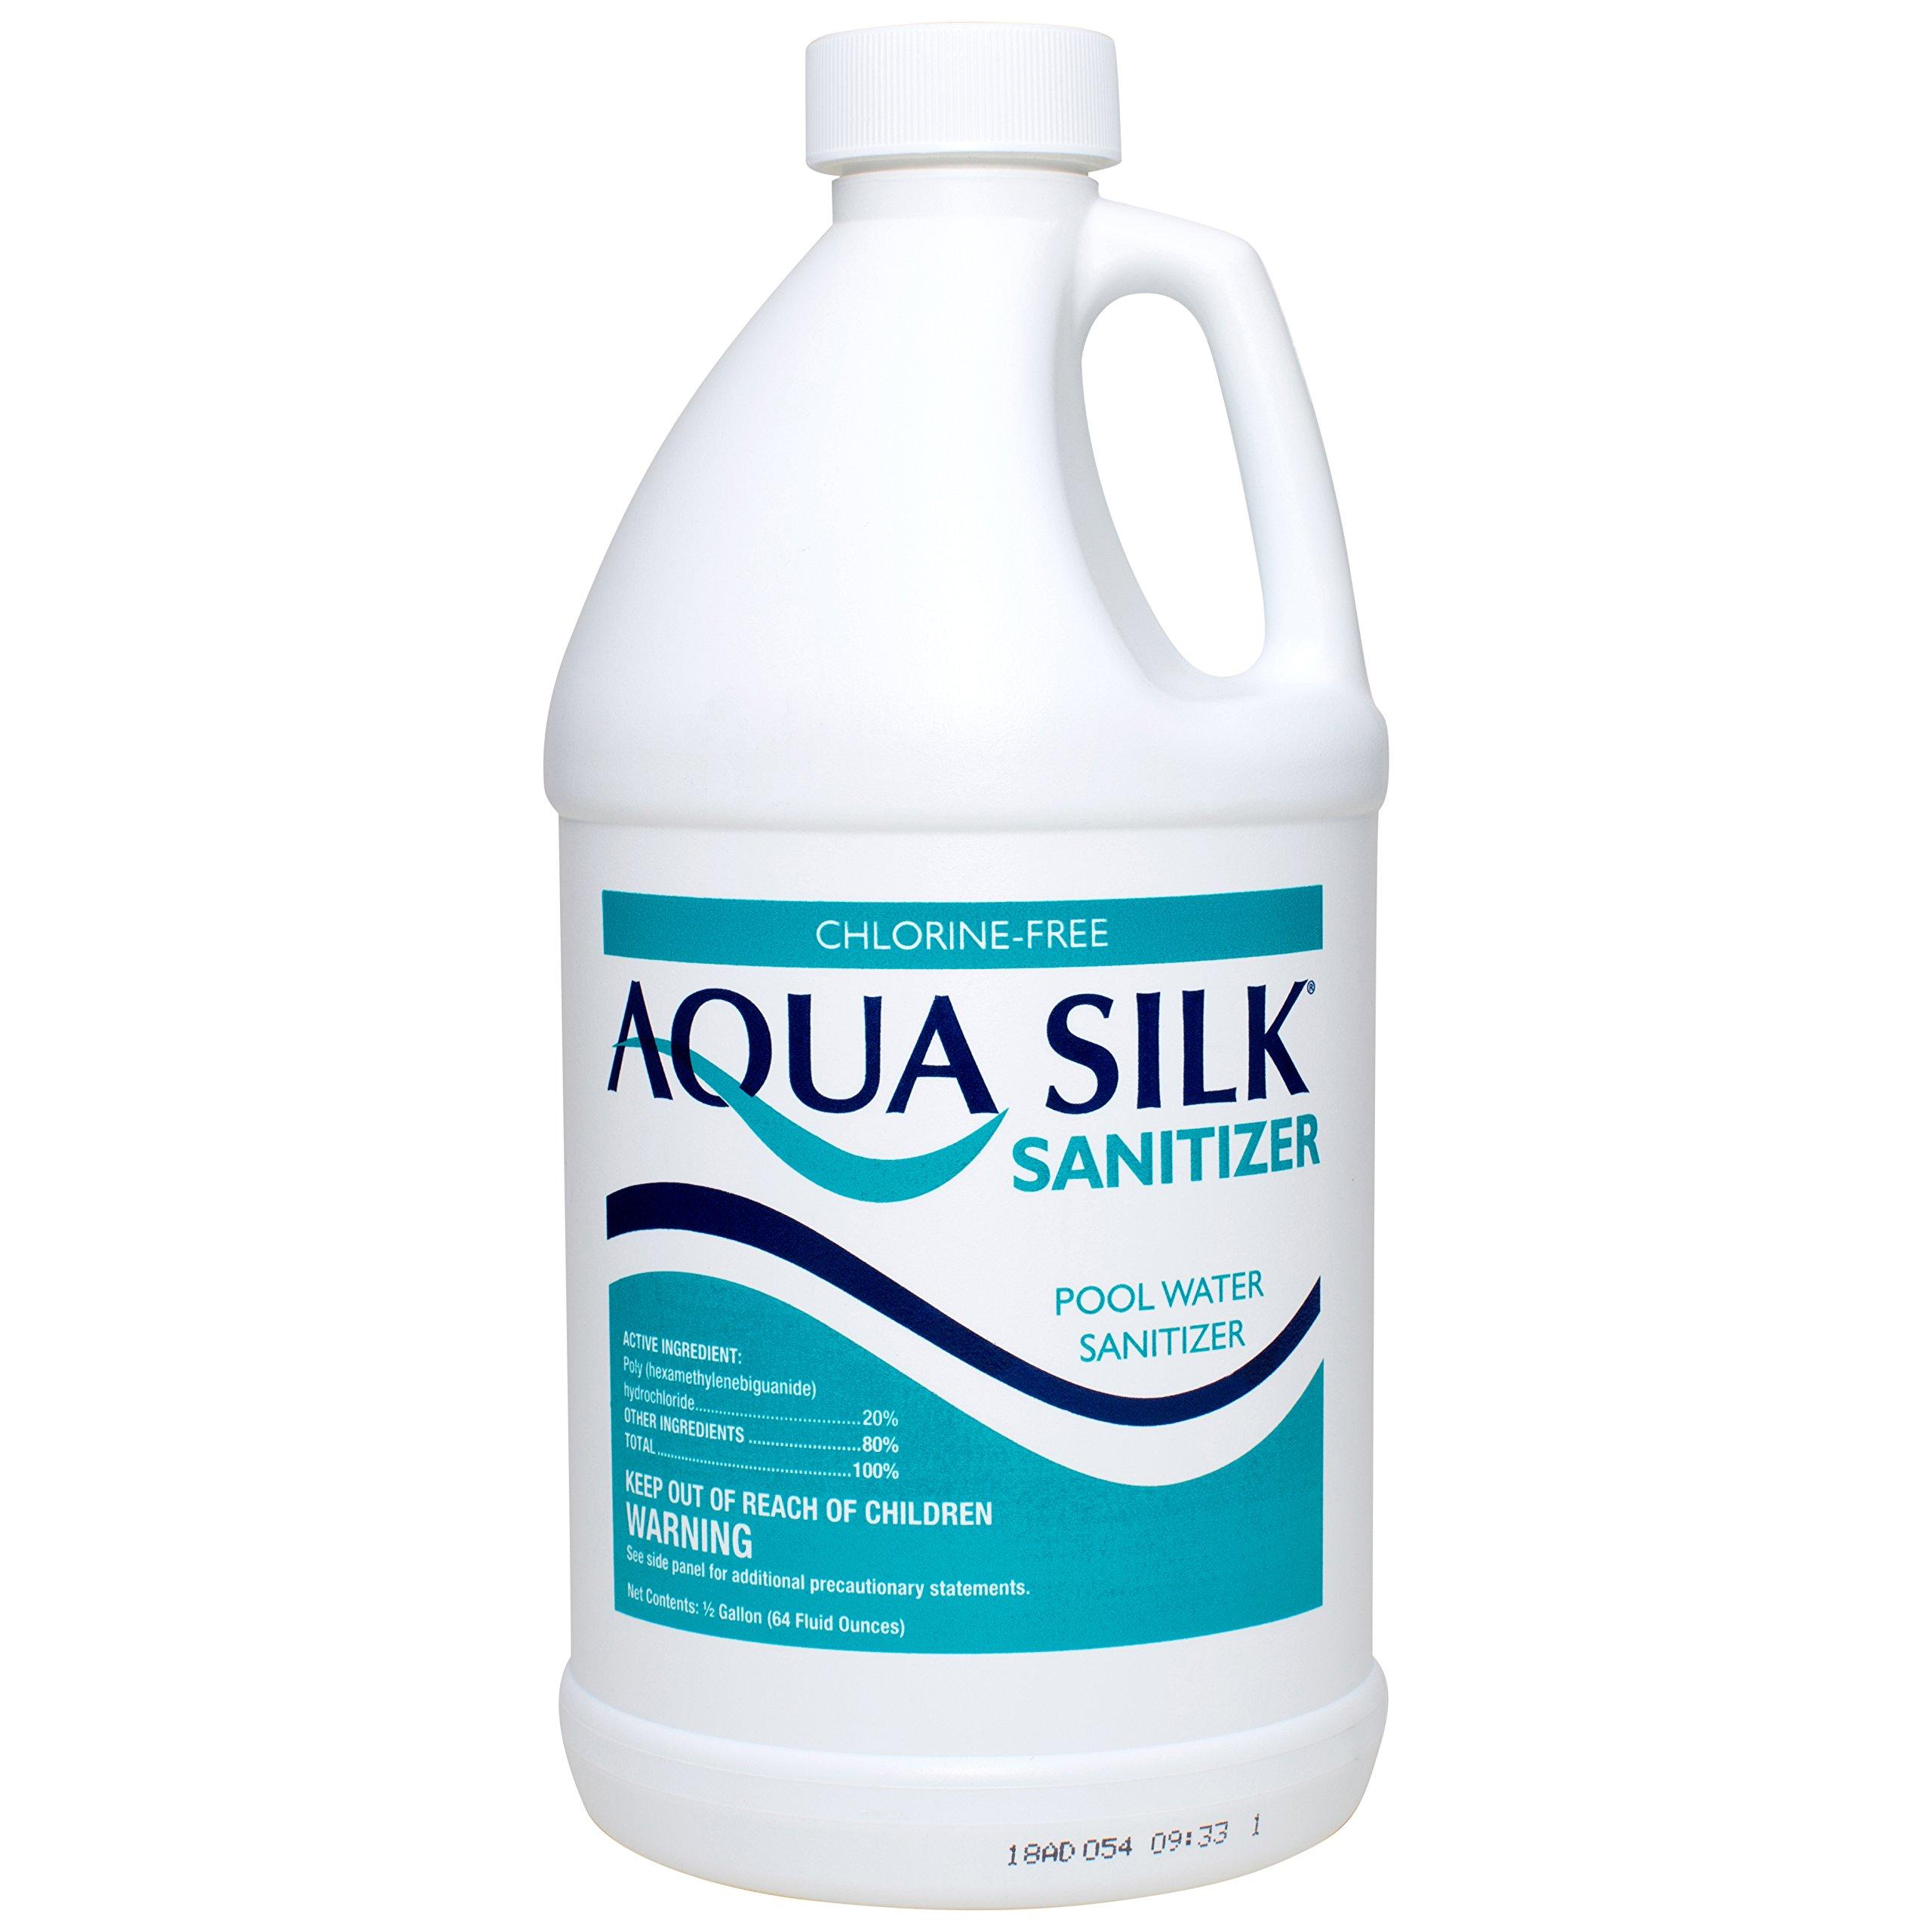 Aqua Silk Chorine-Free Sanitizer (0.5 gal)